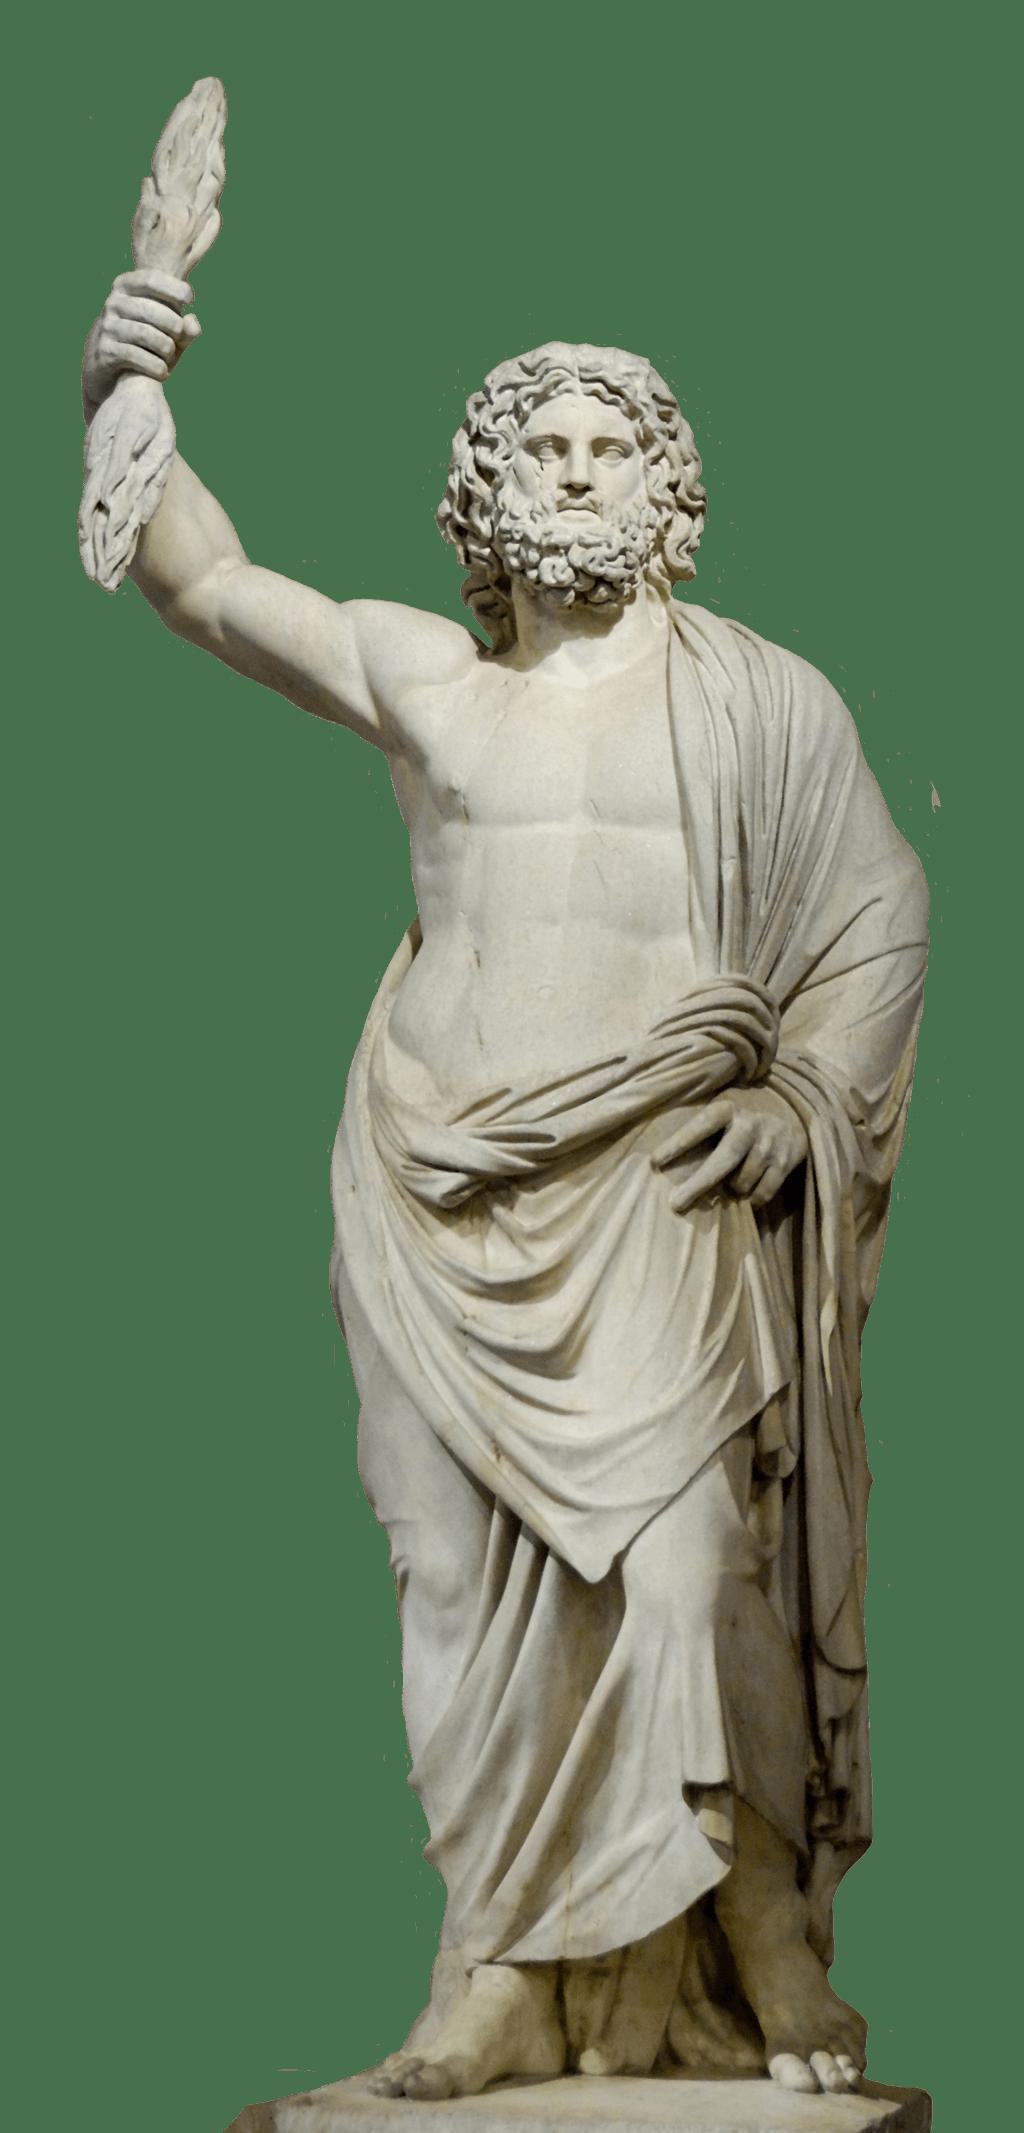 Zeus Statue Transparent Png Stickpng